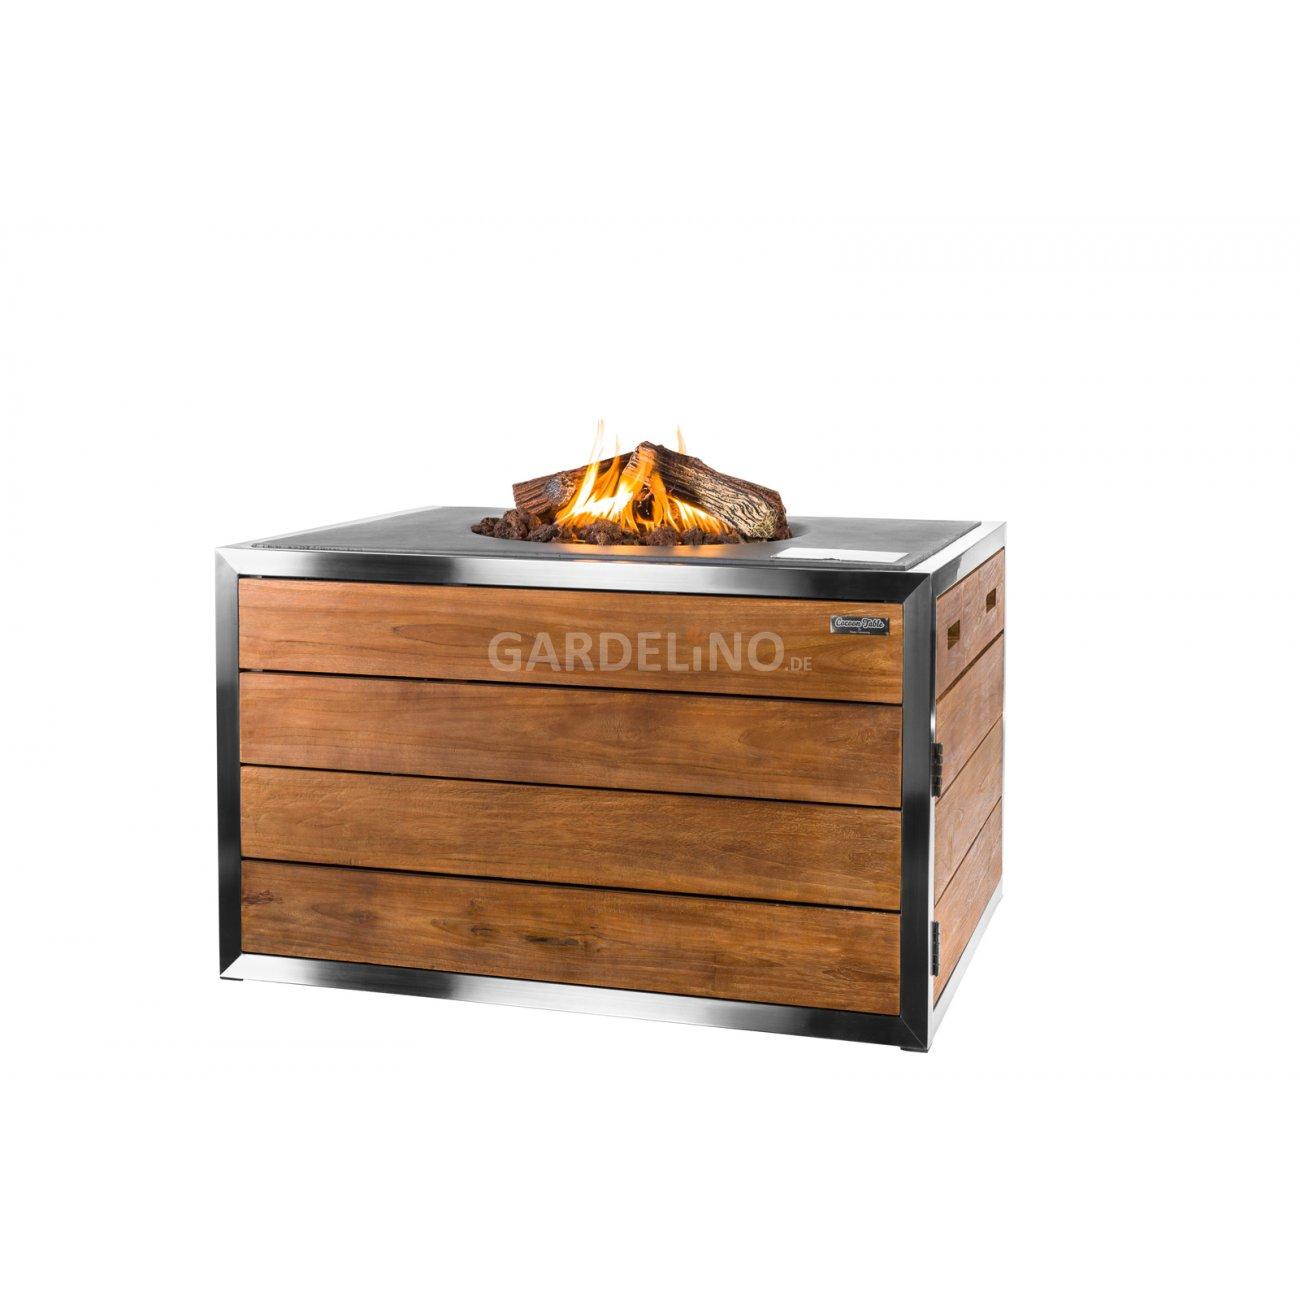 holz feuertisch rechteckig von happy cocooning. Black Bedroom Furniture Sets. Home Design Ideas